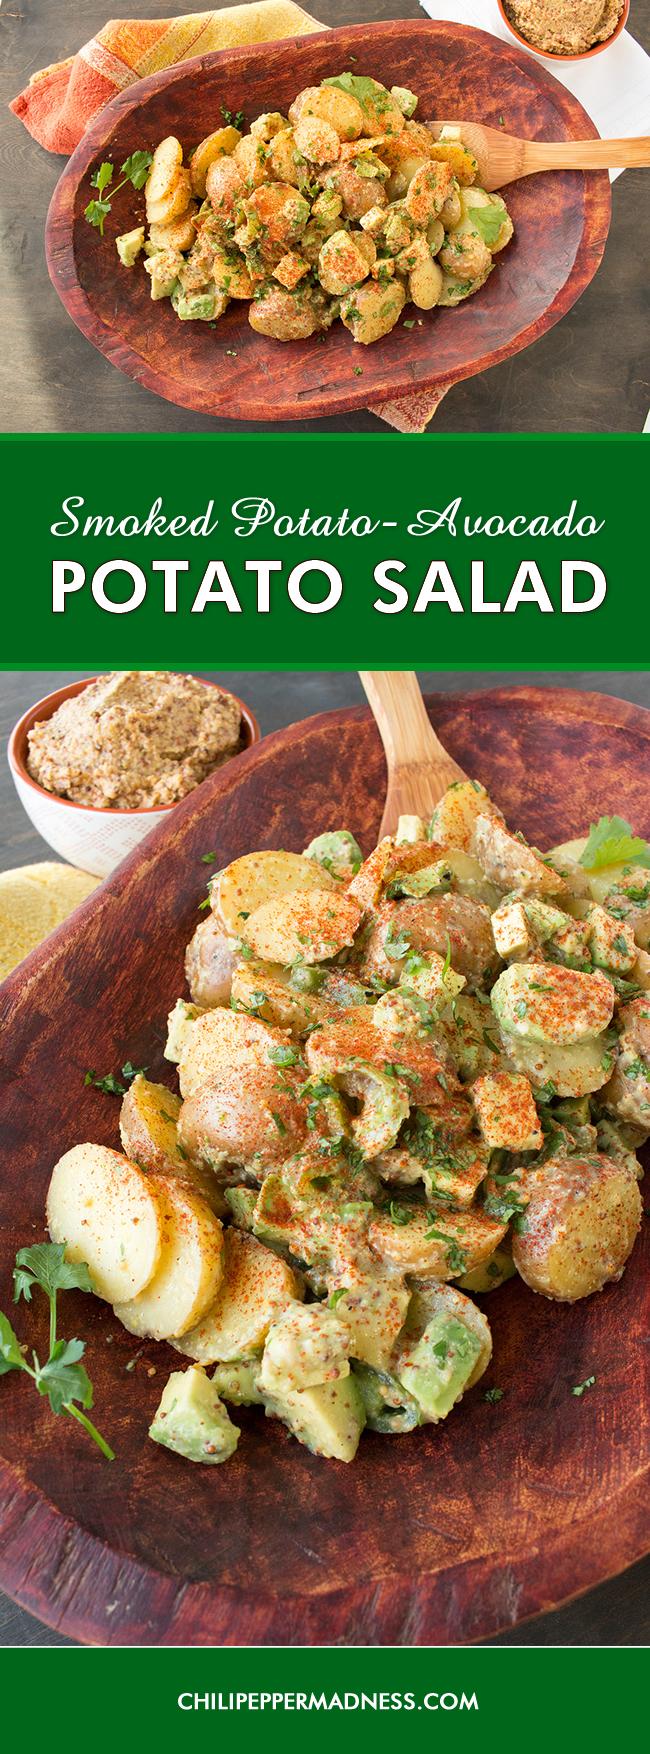 Smoked Potato-Avocado Potato Salad Recipe